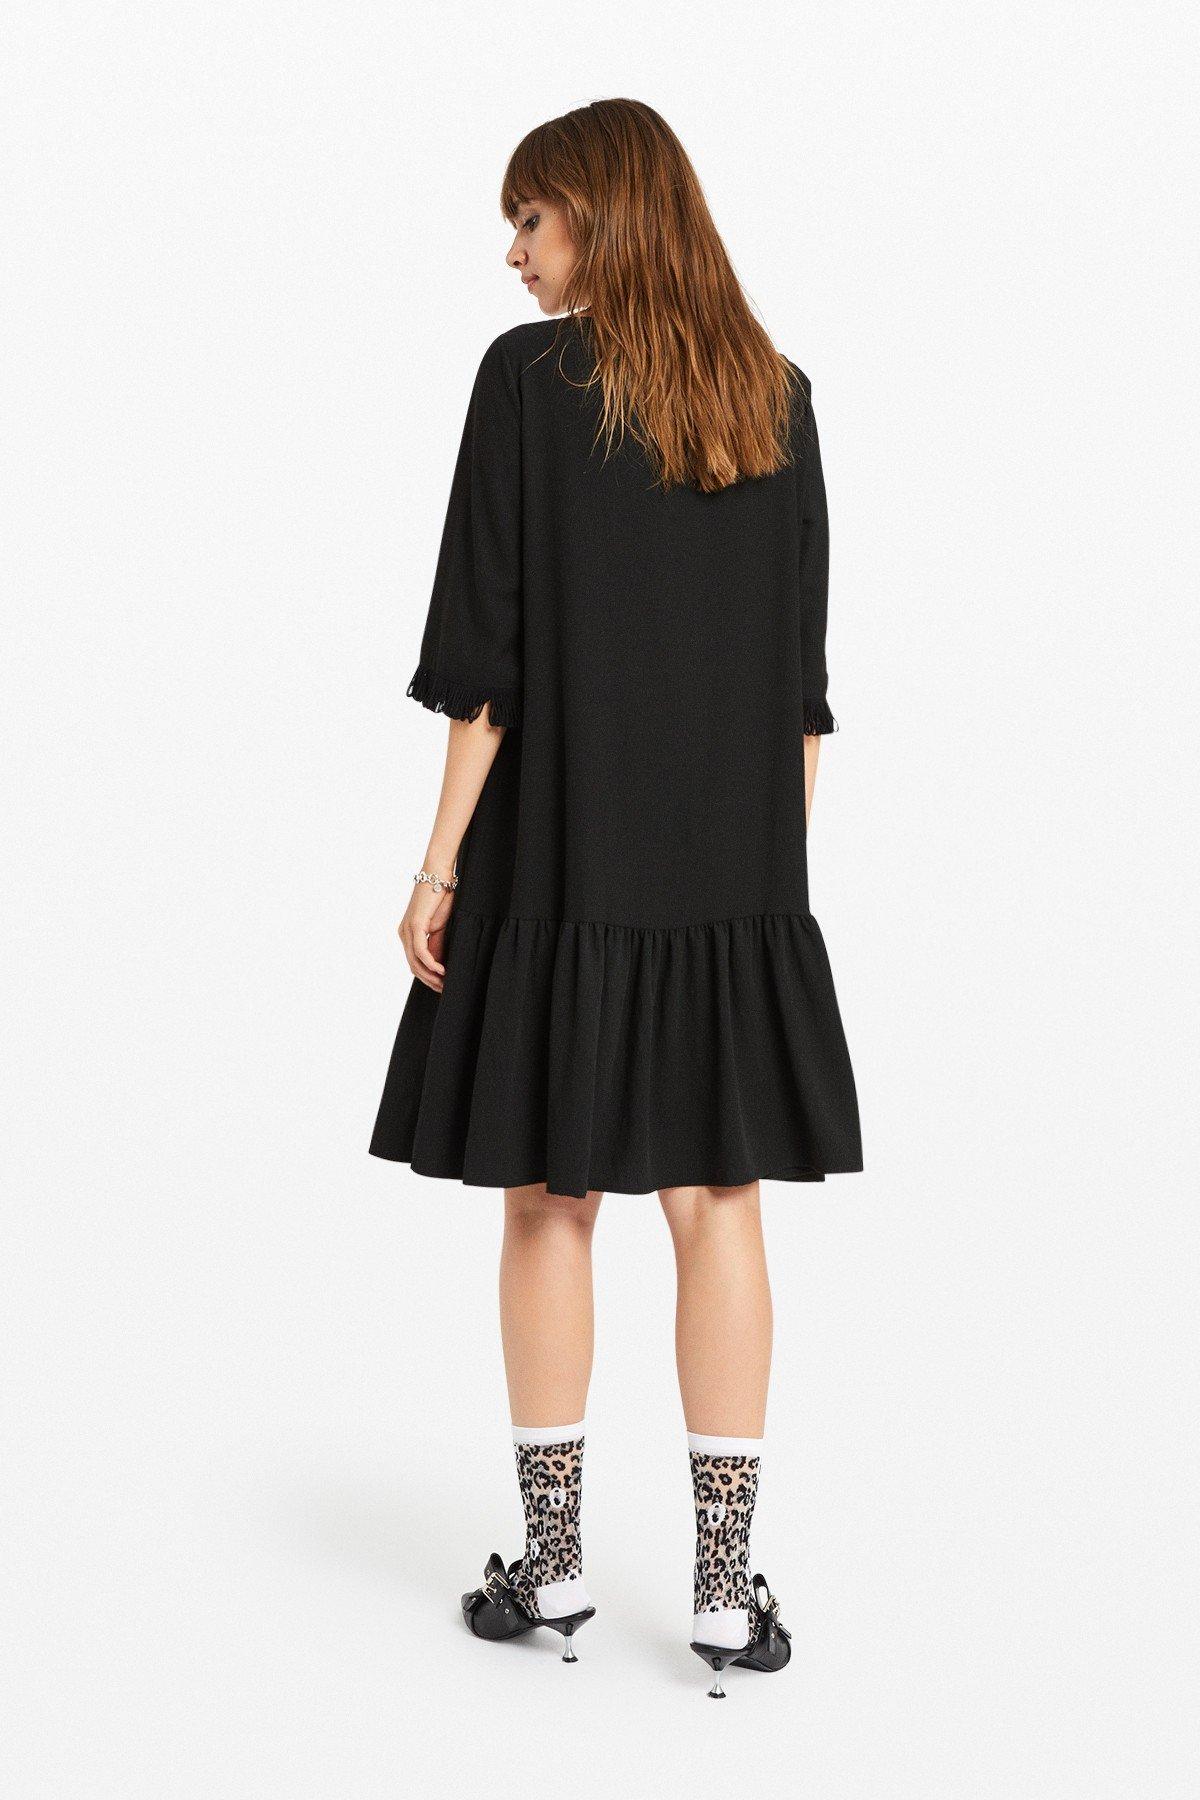 Midi dress with ruffle at the bottom